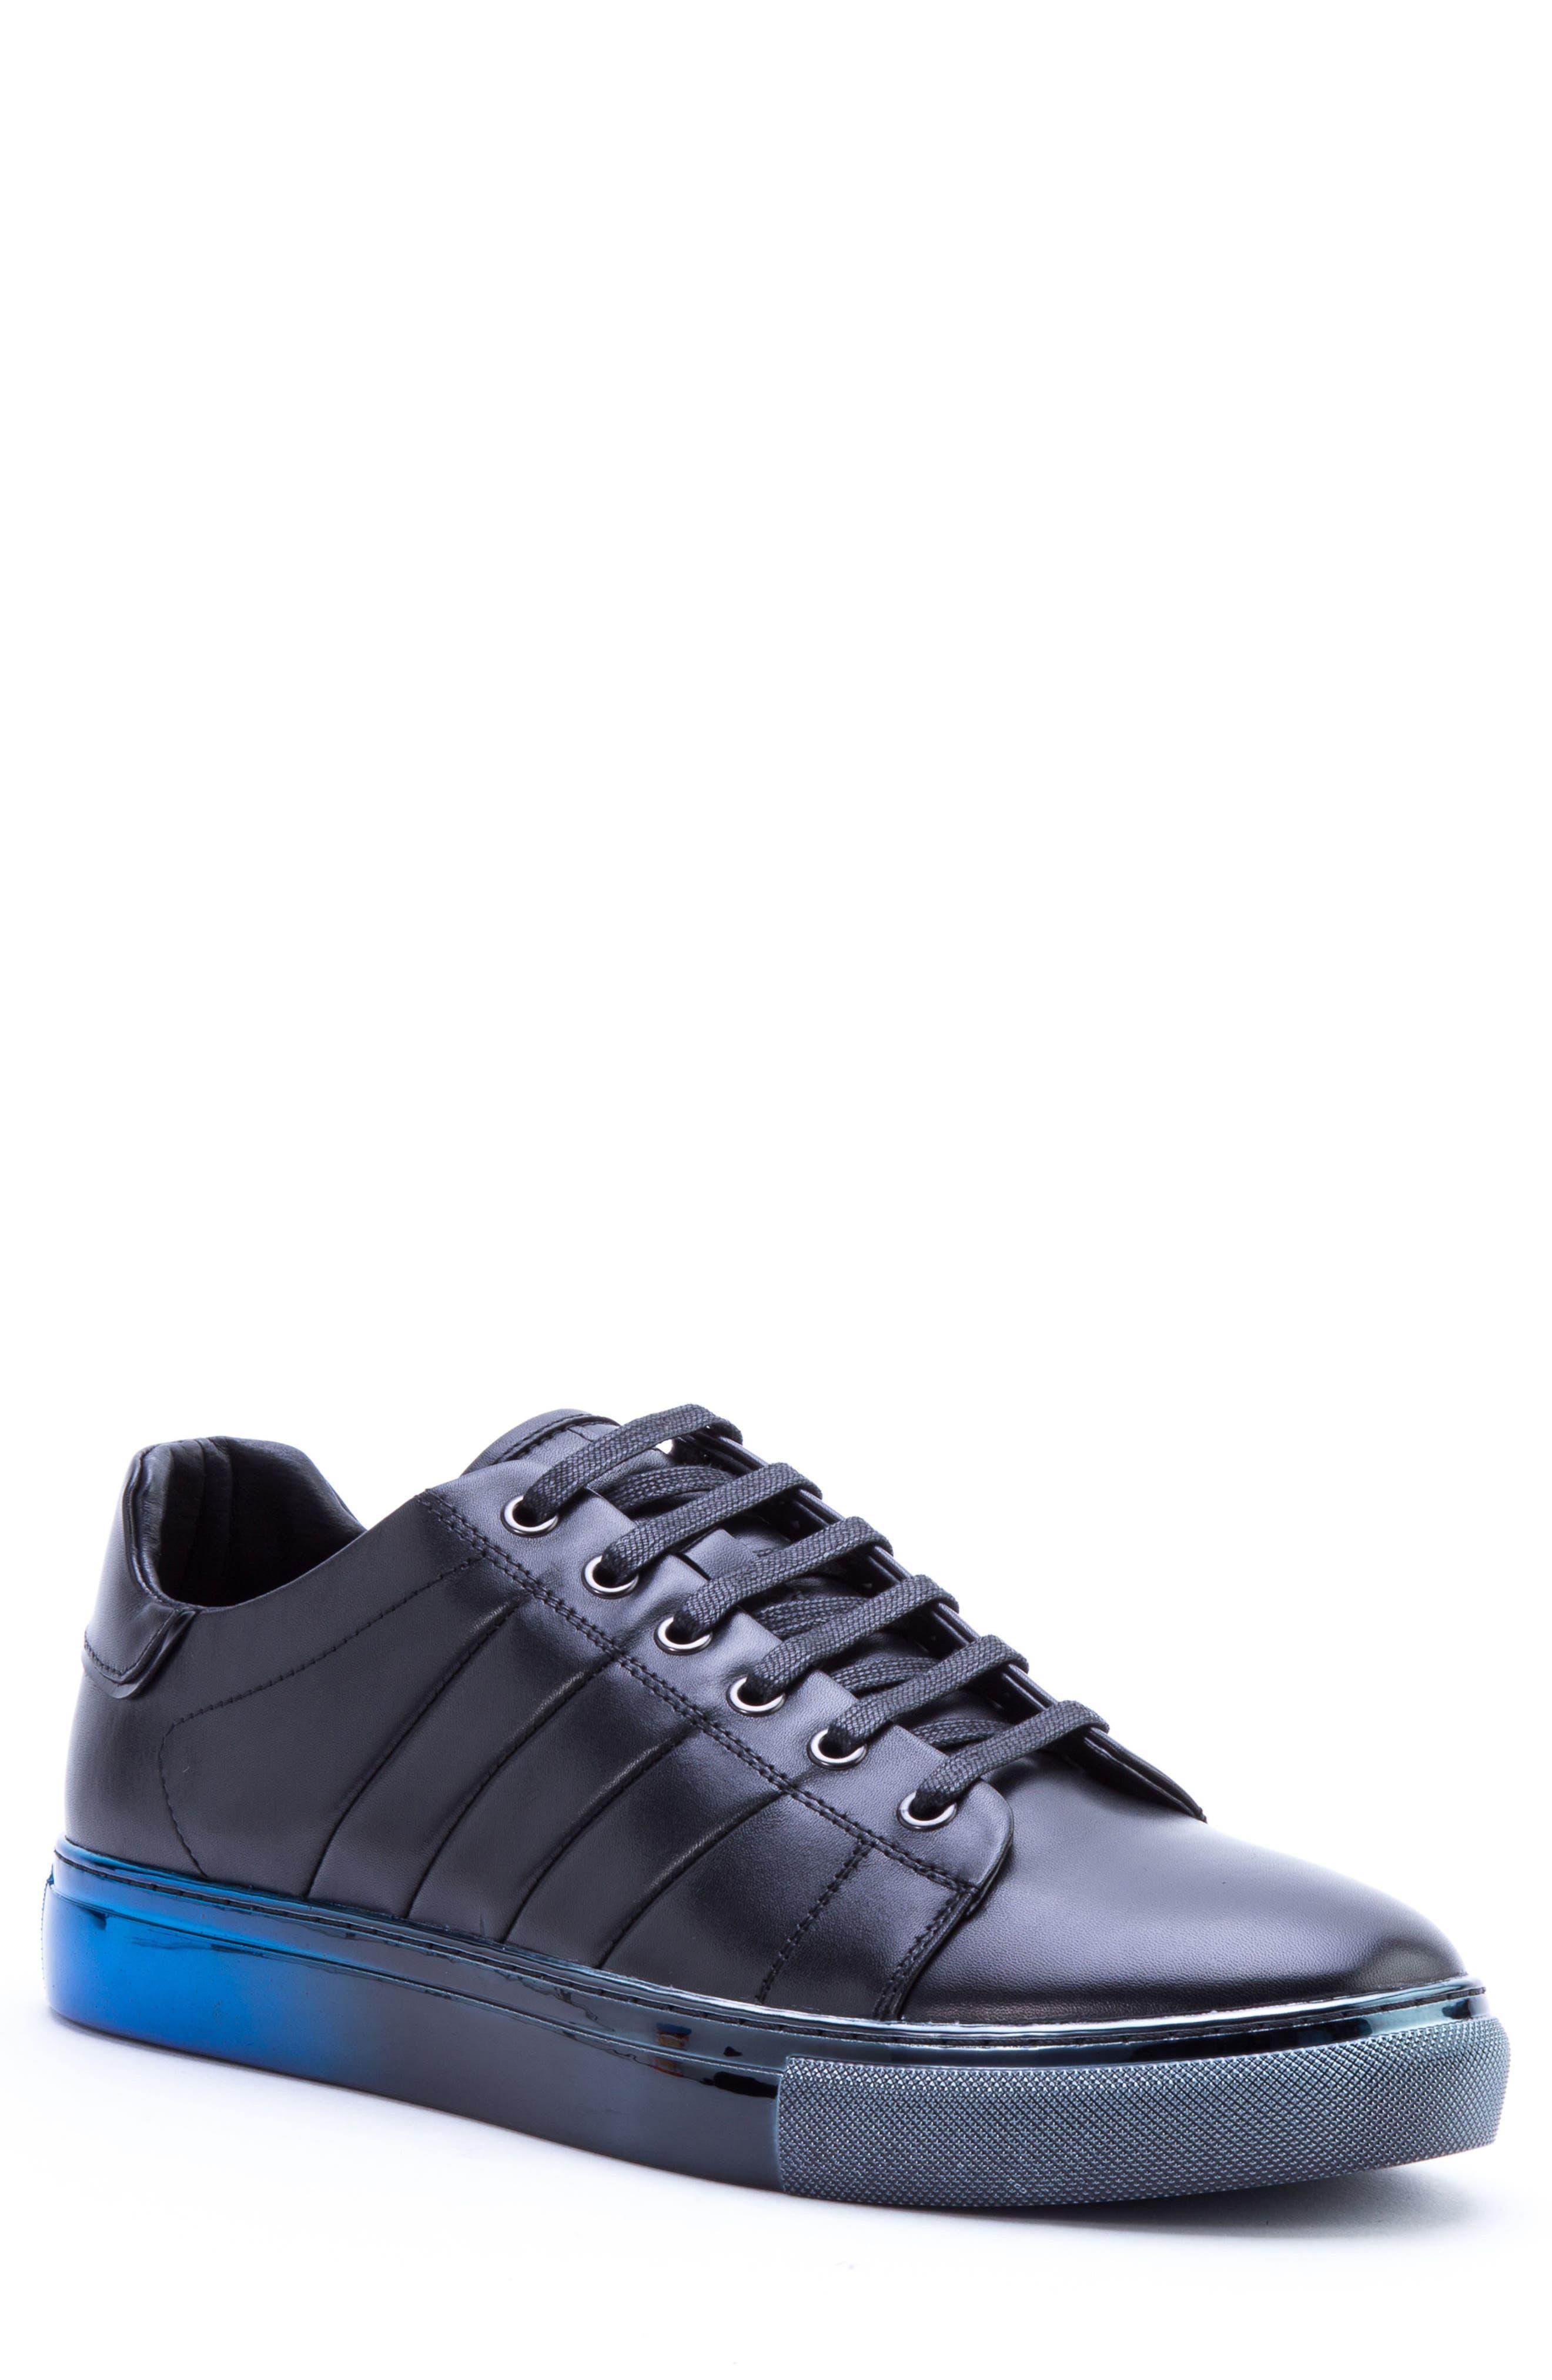 BADGLEY MISCHKA COLLECTION, Badgley Mischka Brando Sneaker, Main thumbnail 1, color, BLACK LEATHER